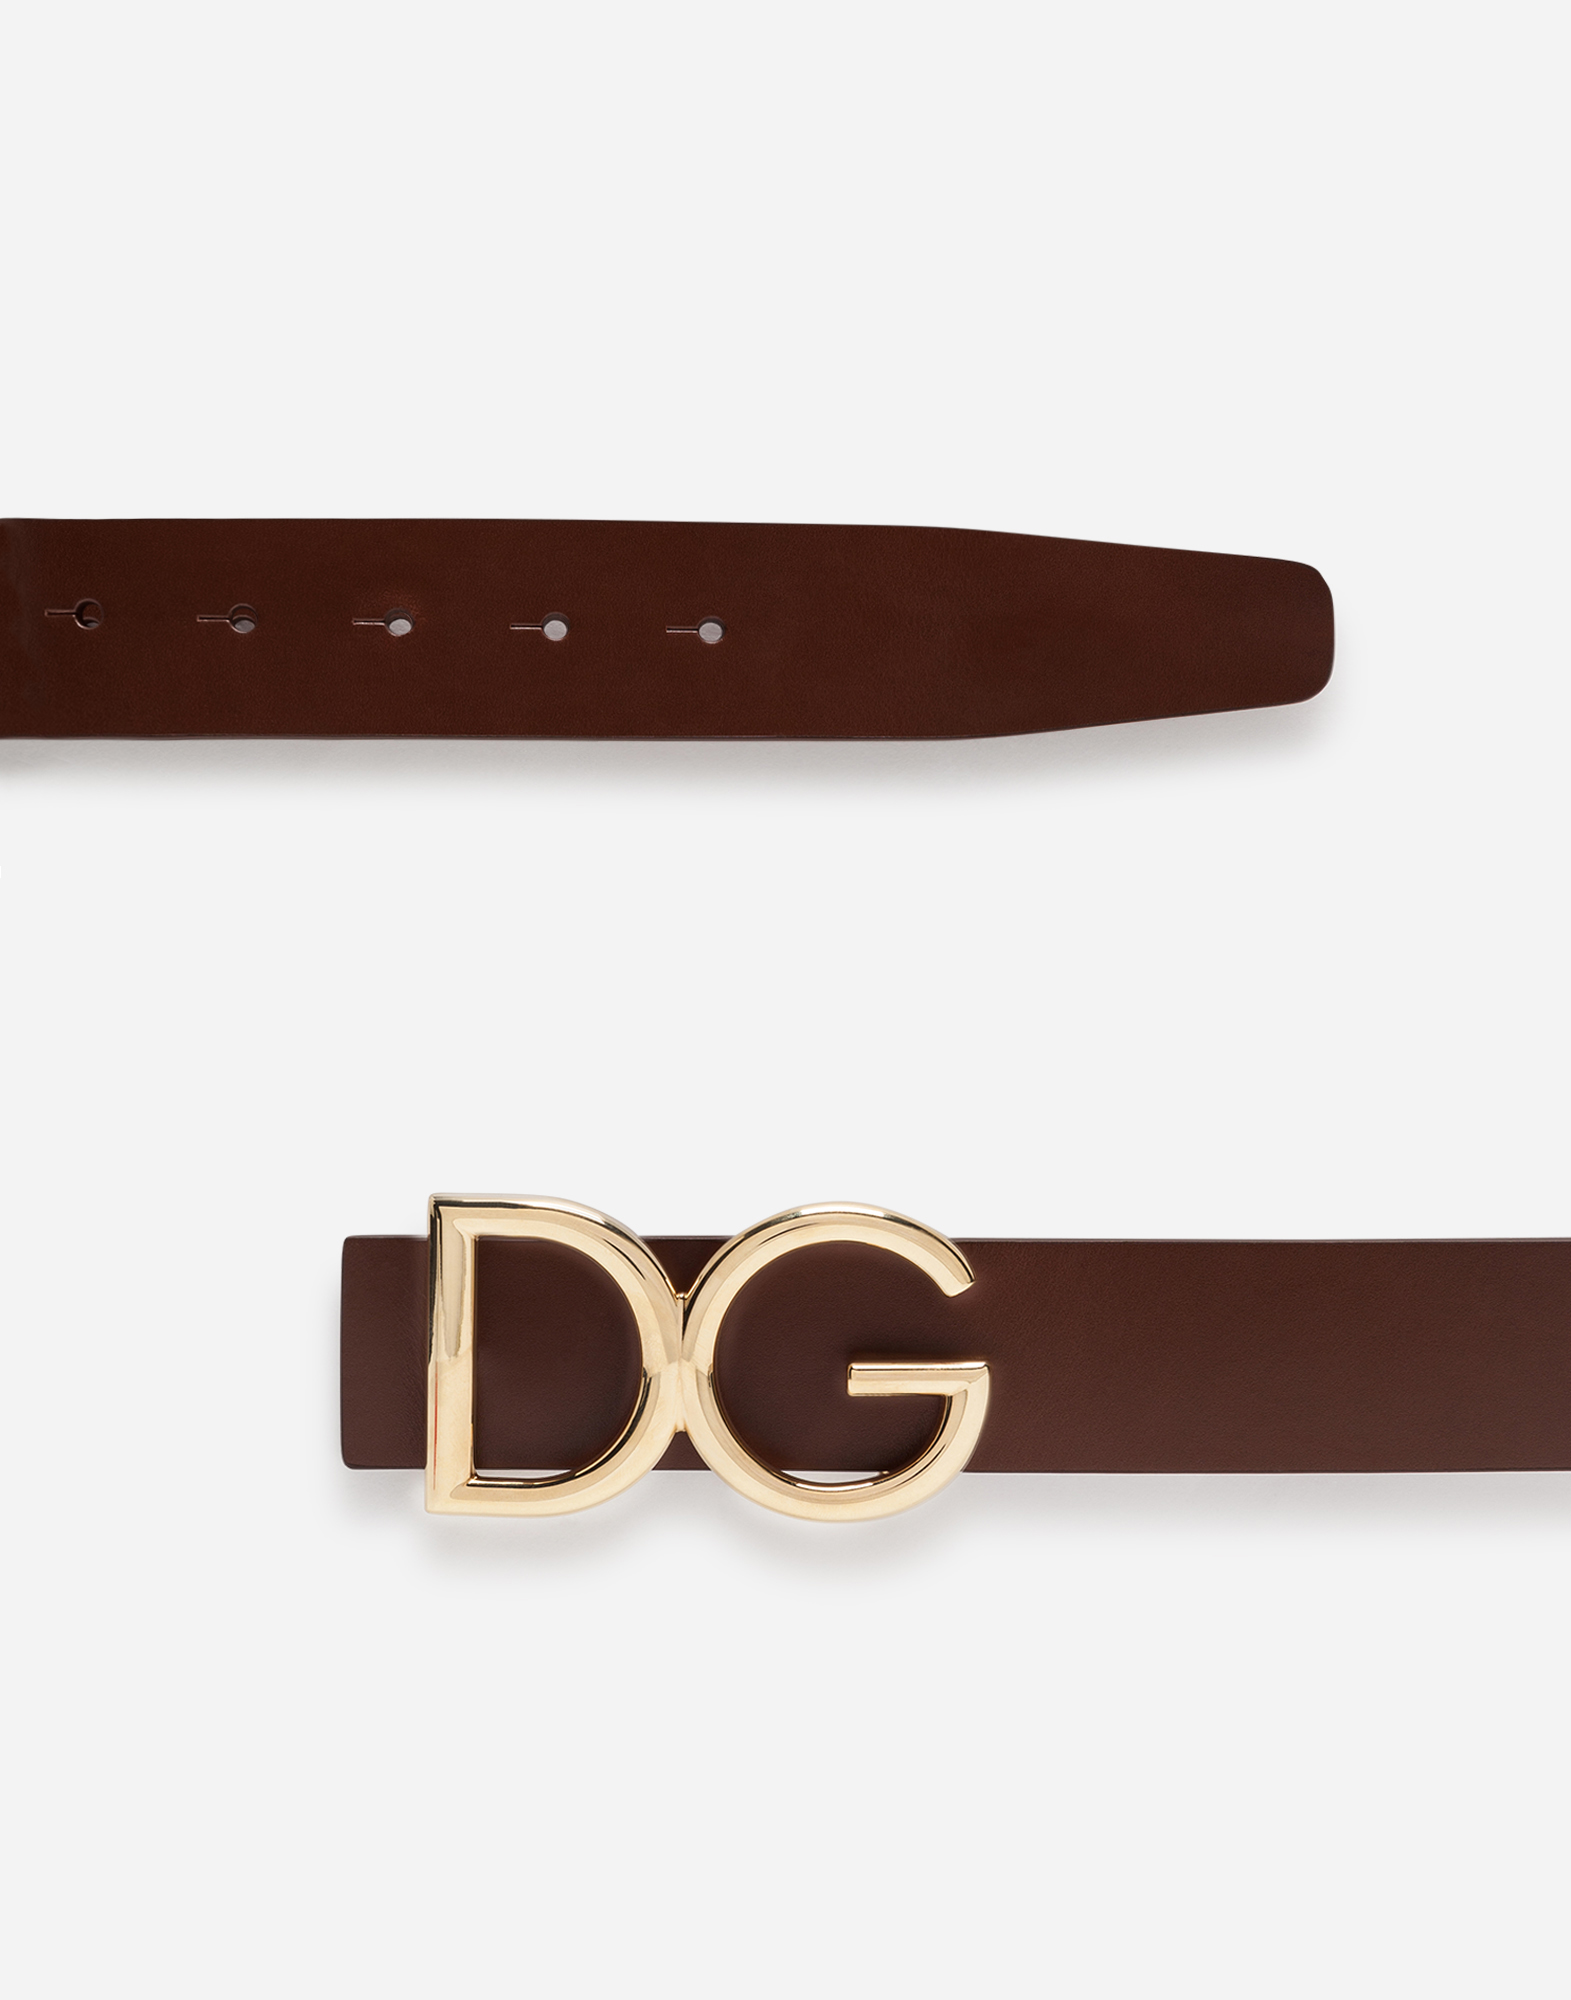 Dolce&Gabbana DAUPHINE LEATHER BELT